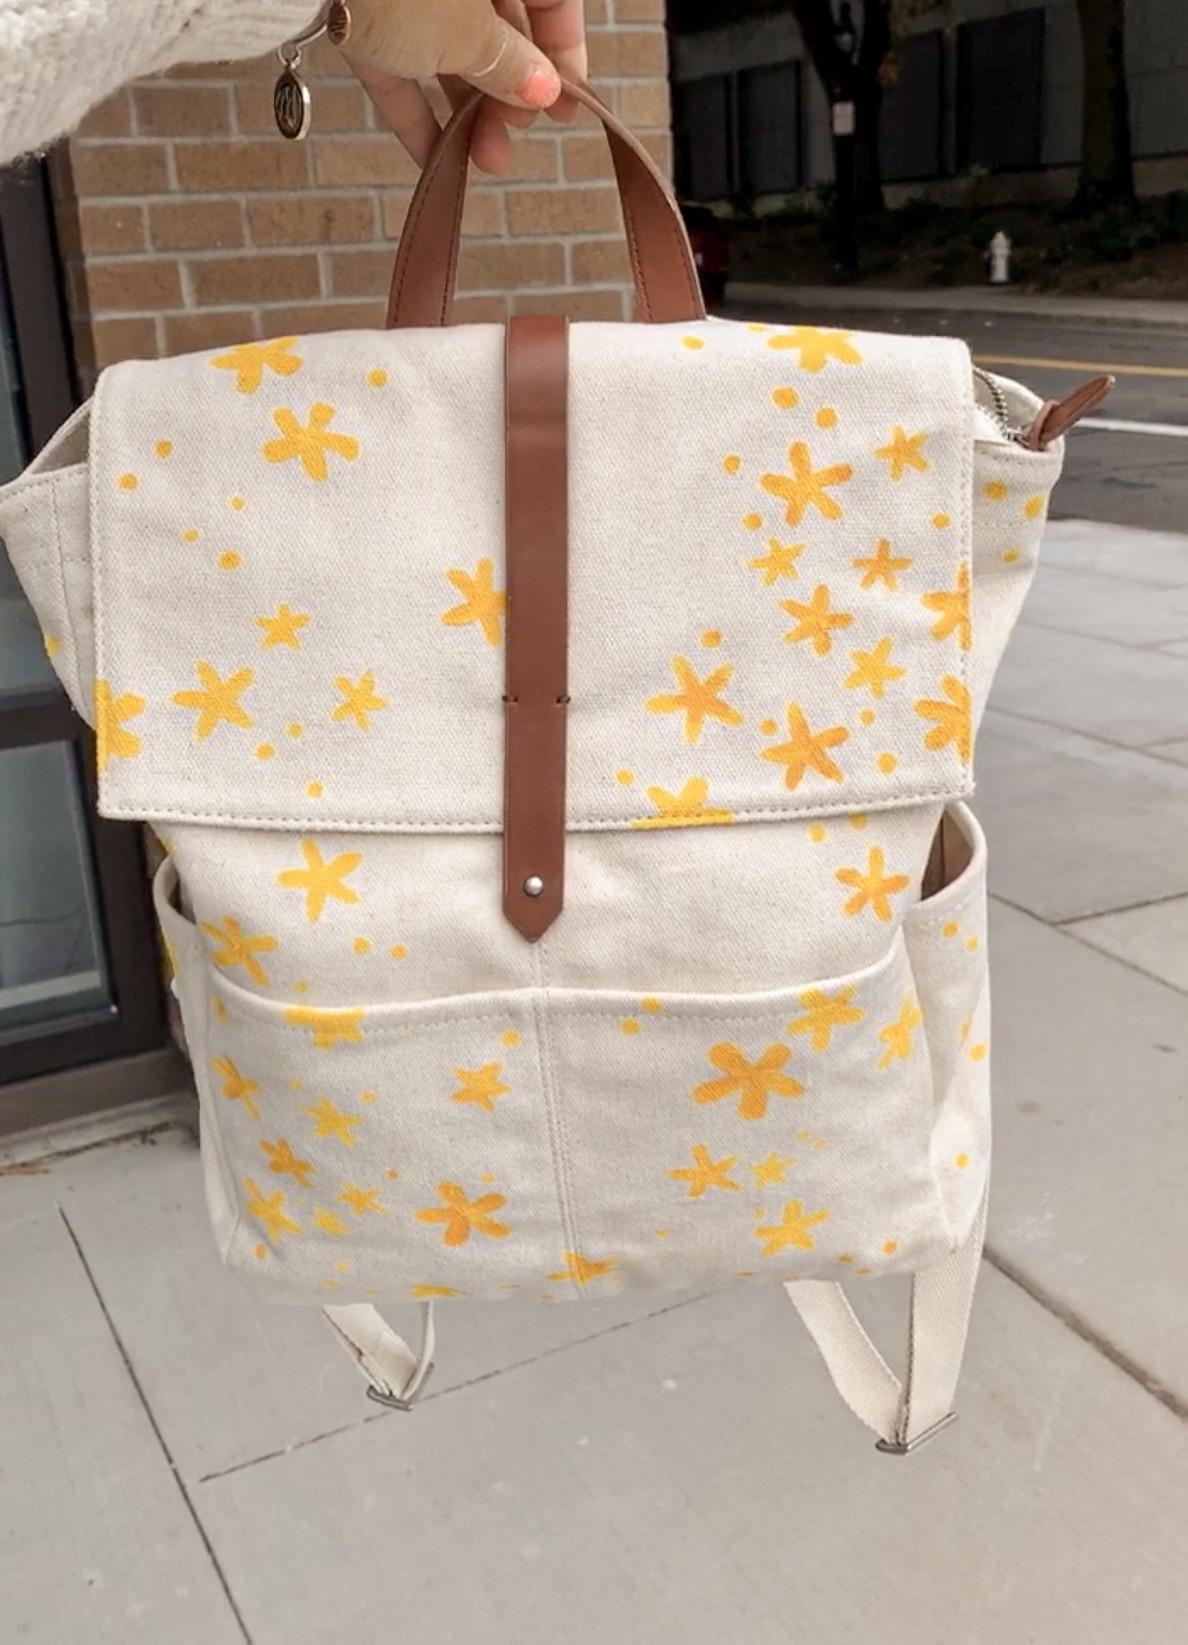 Three Easy Ways To Update Your Wardrobe - DIY Backpack